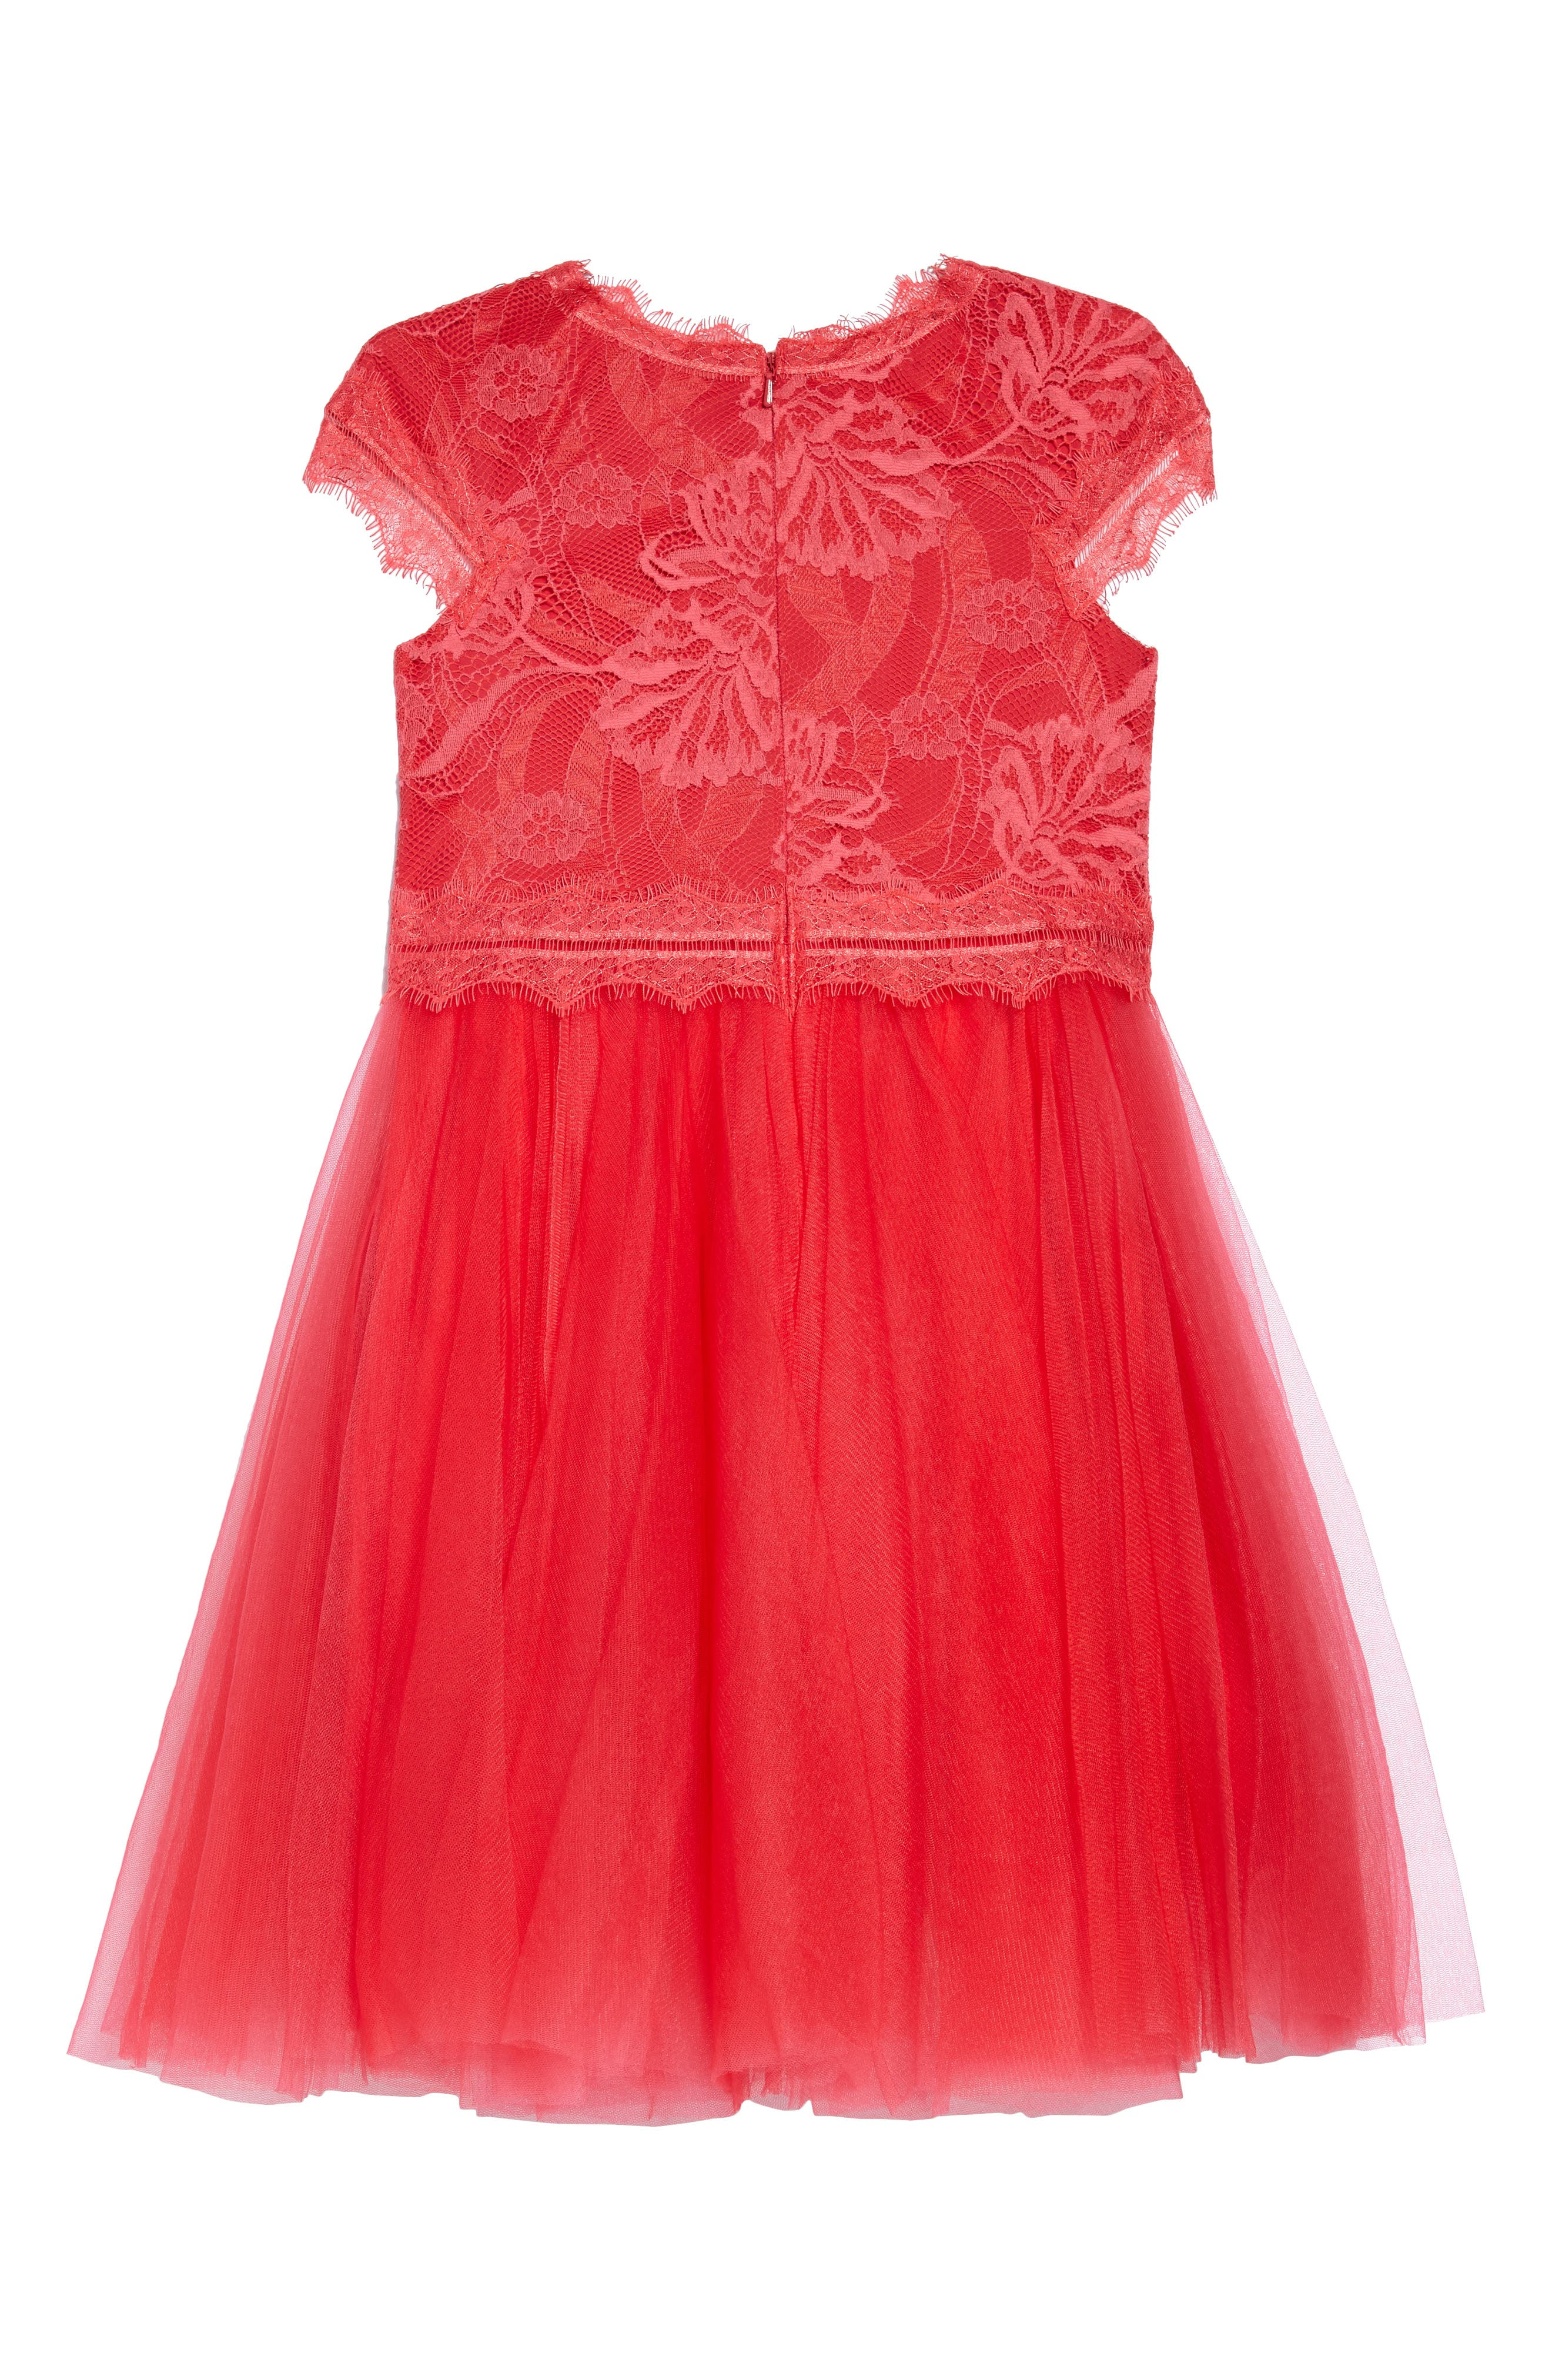 Floral Lace Tulle Dress,                             Alternate thumbnail 2, color,                             605